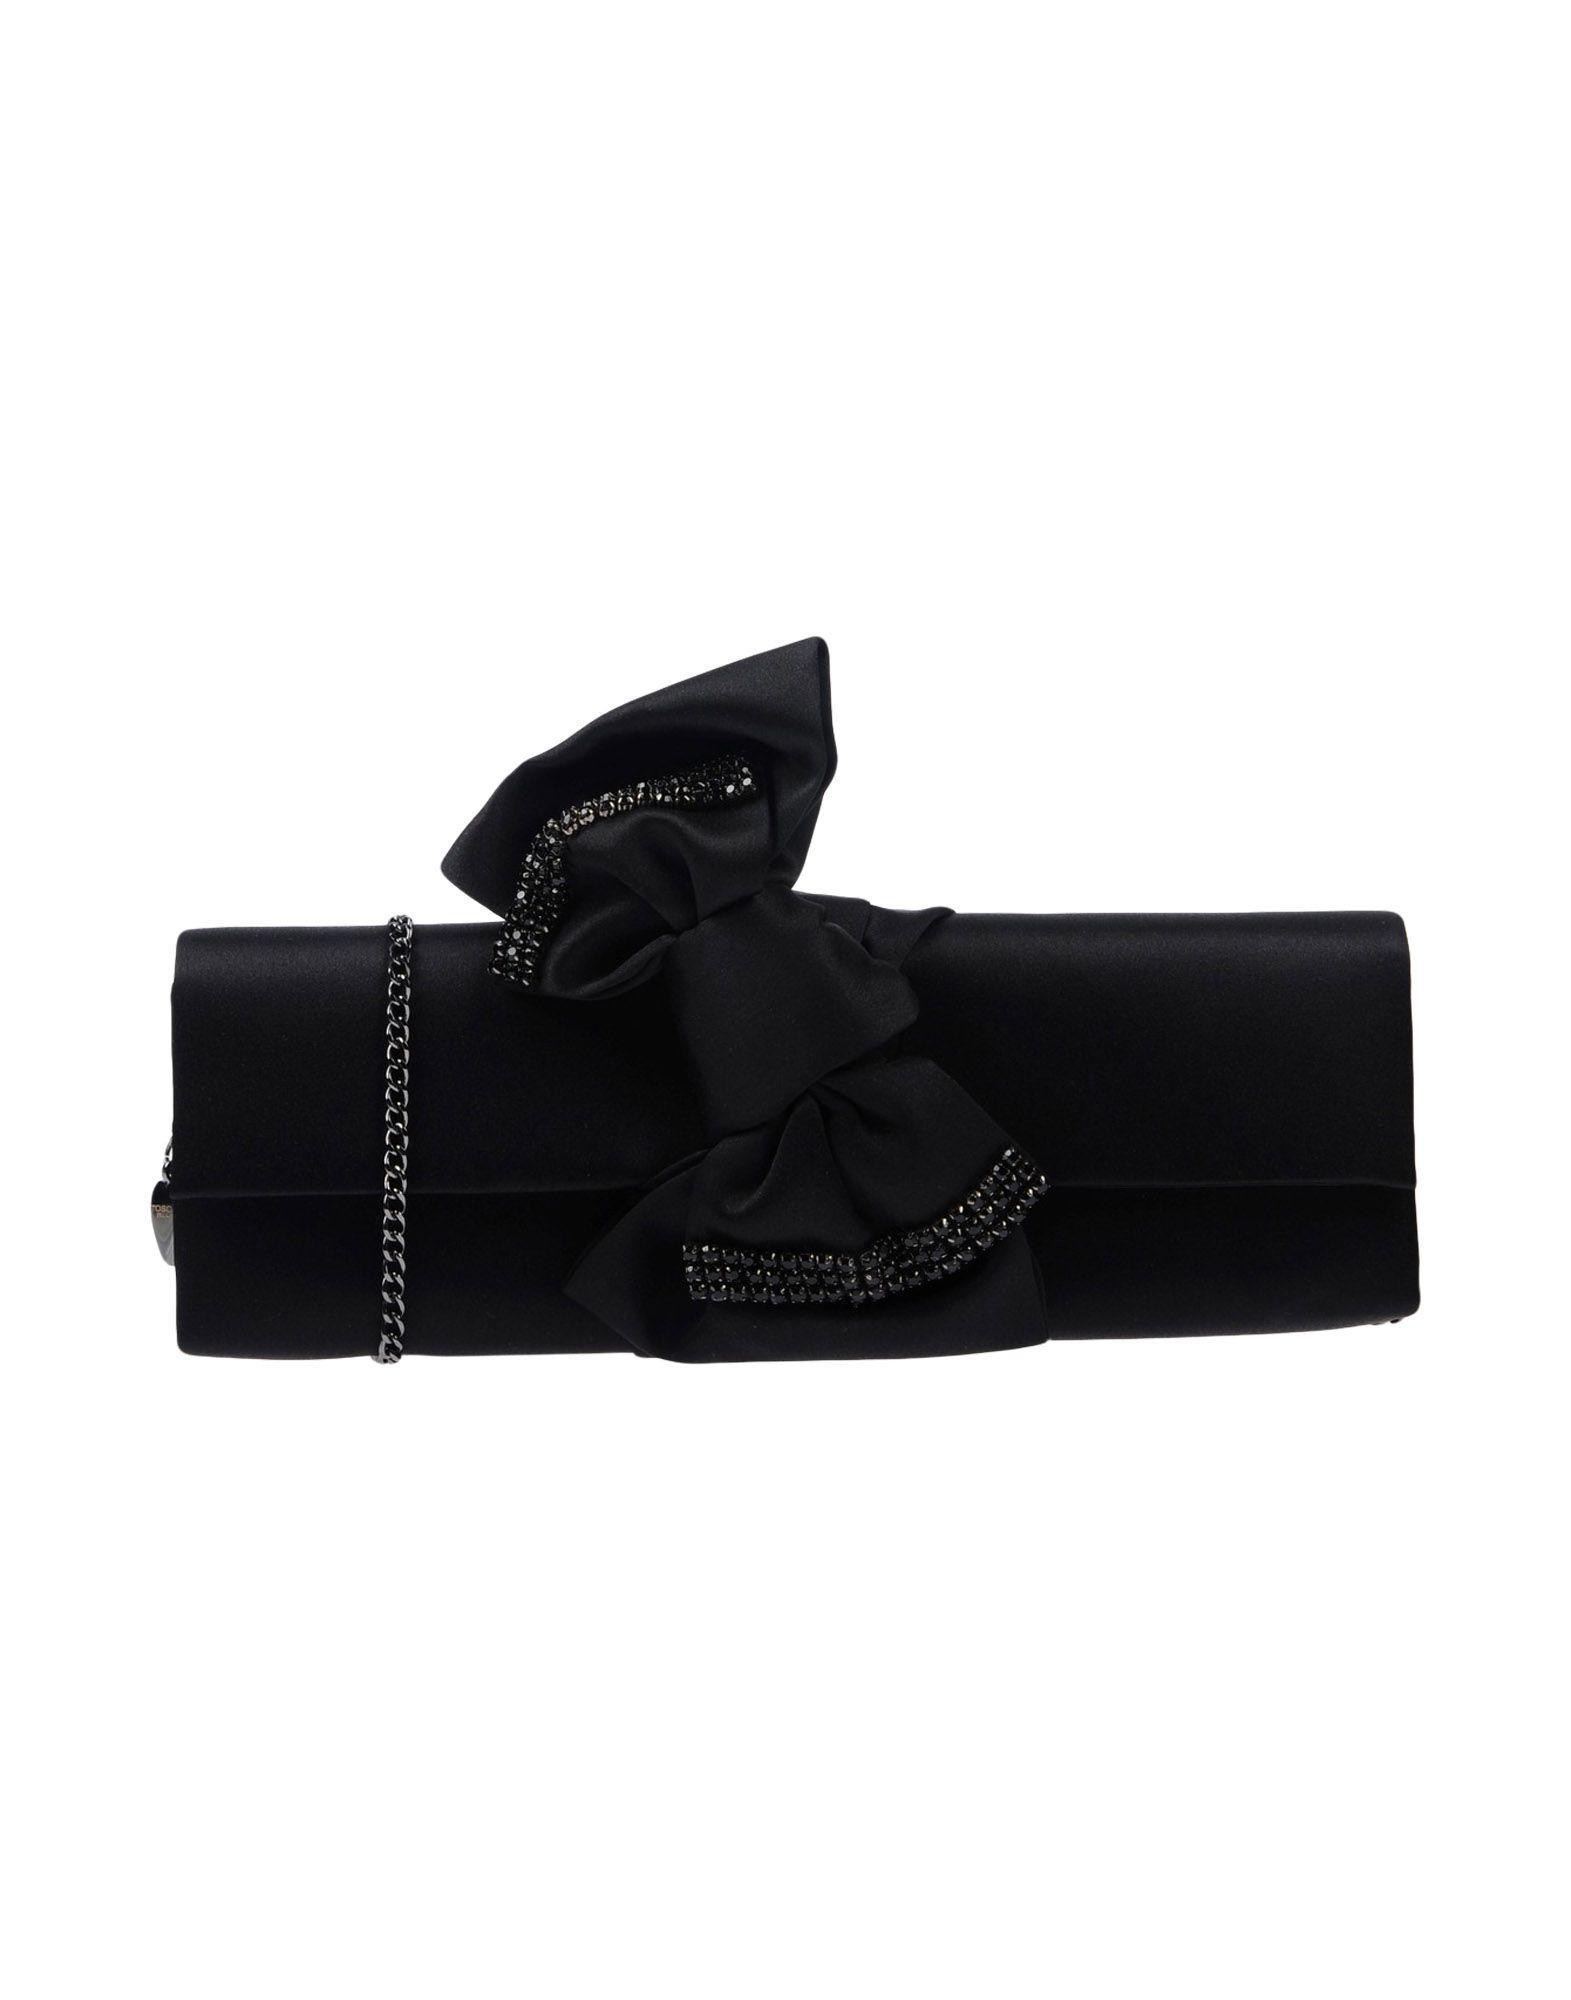 4a71d570992418 Tosca Blu Handbags in Black - Lyst